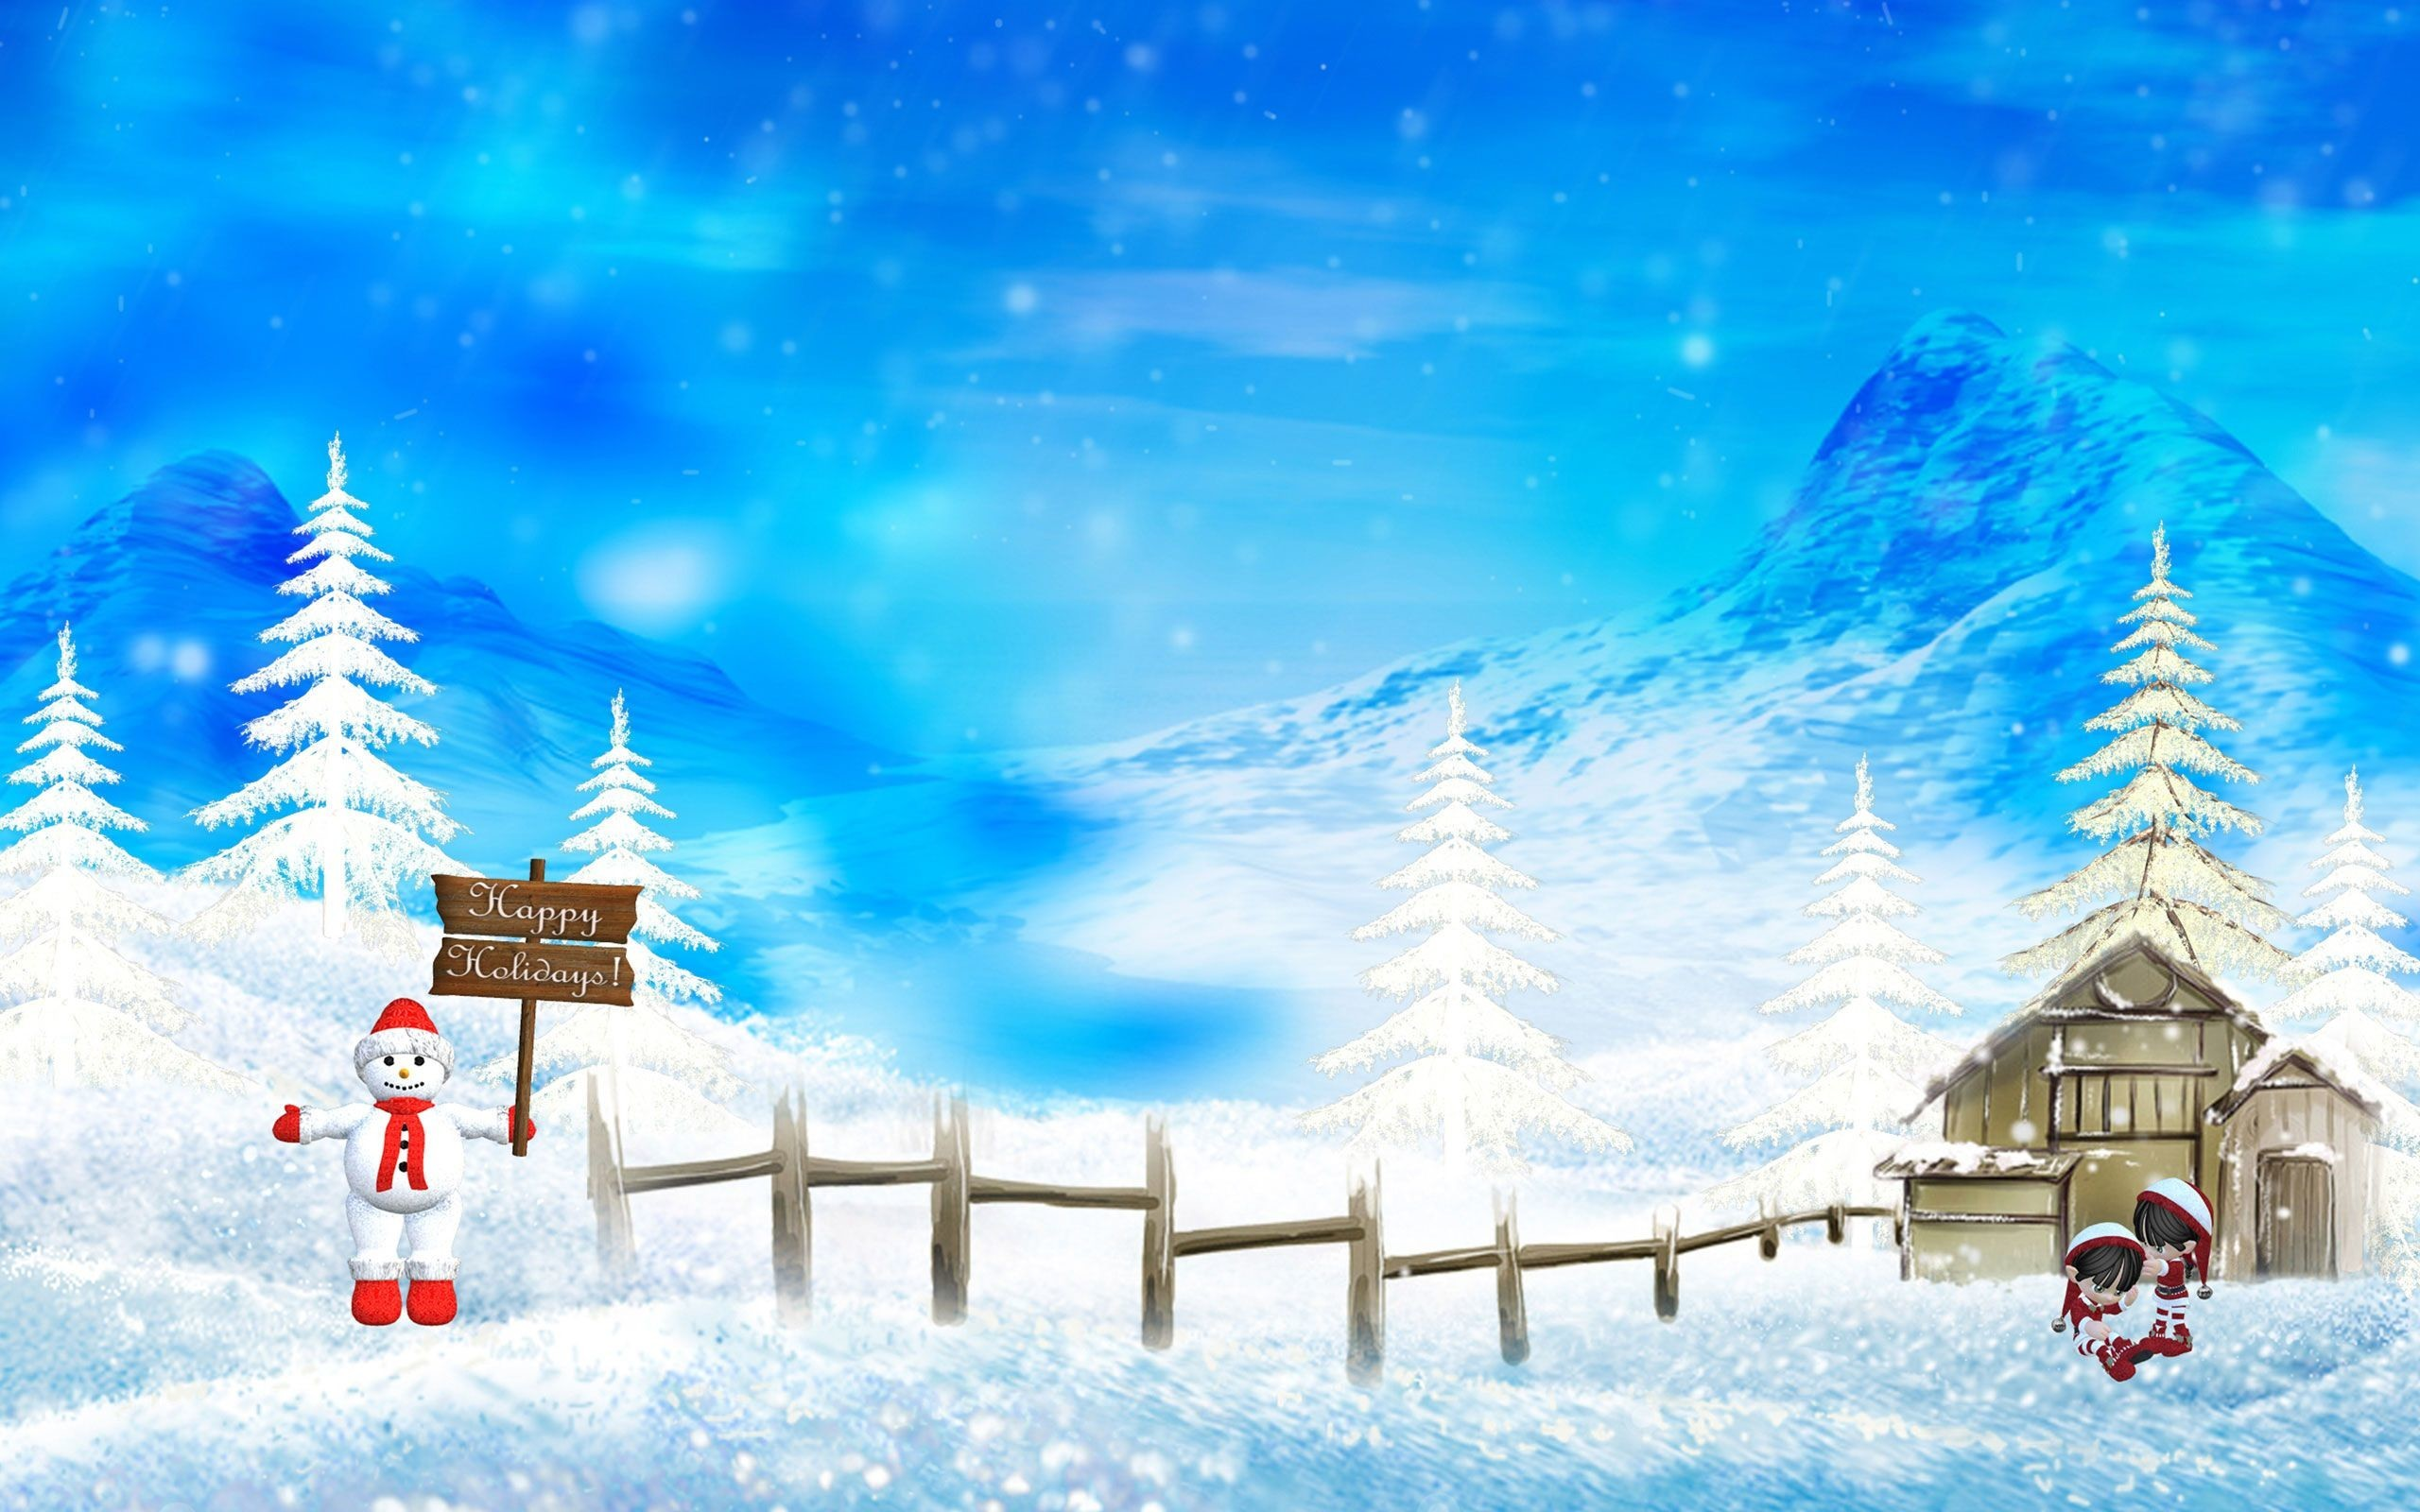 Res: 2560x1600, 2560x1440 Desktop Wallpaper 2560x1440 · Download · 2880x1800 happy holidays  755705